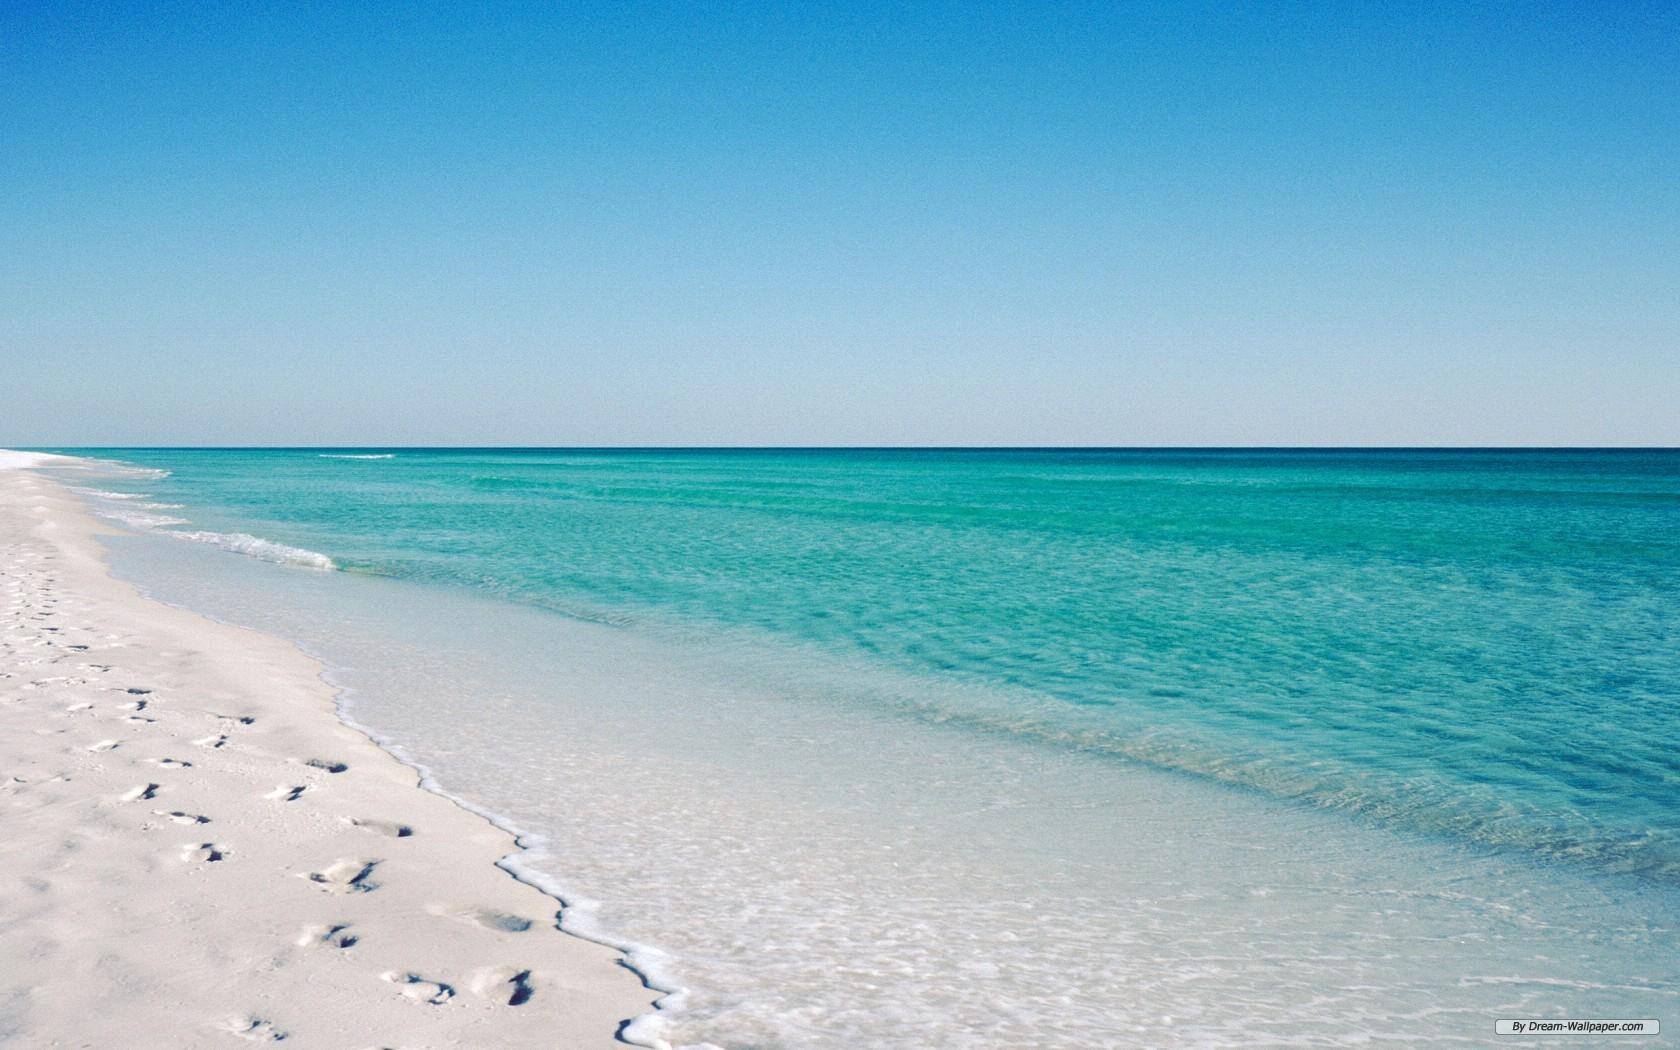 Tis' The Season to be in Florida - Littlegate Publishing